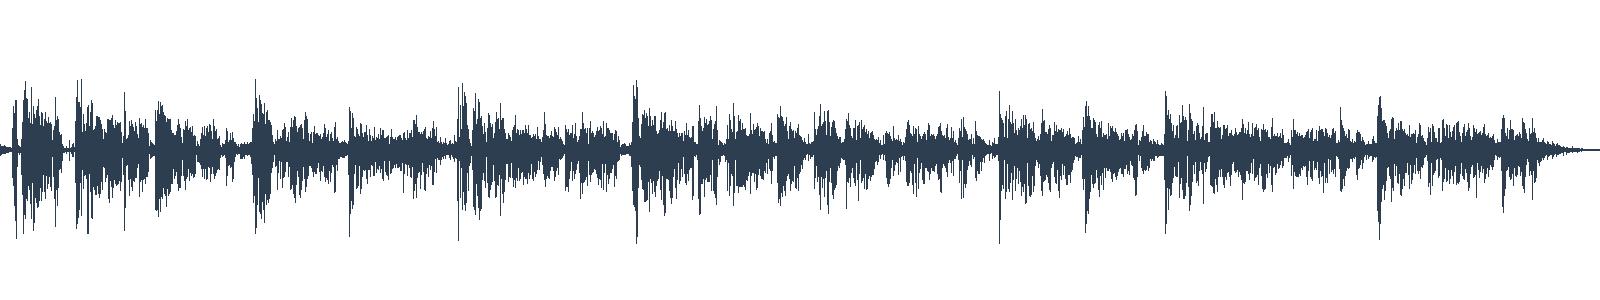 Nové audioknihy 10/2019 waveform